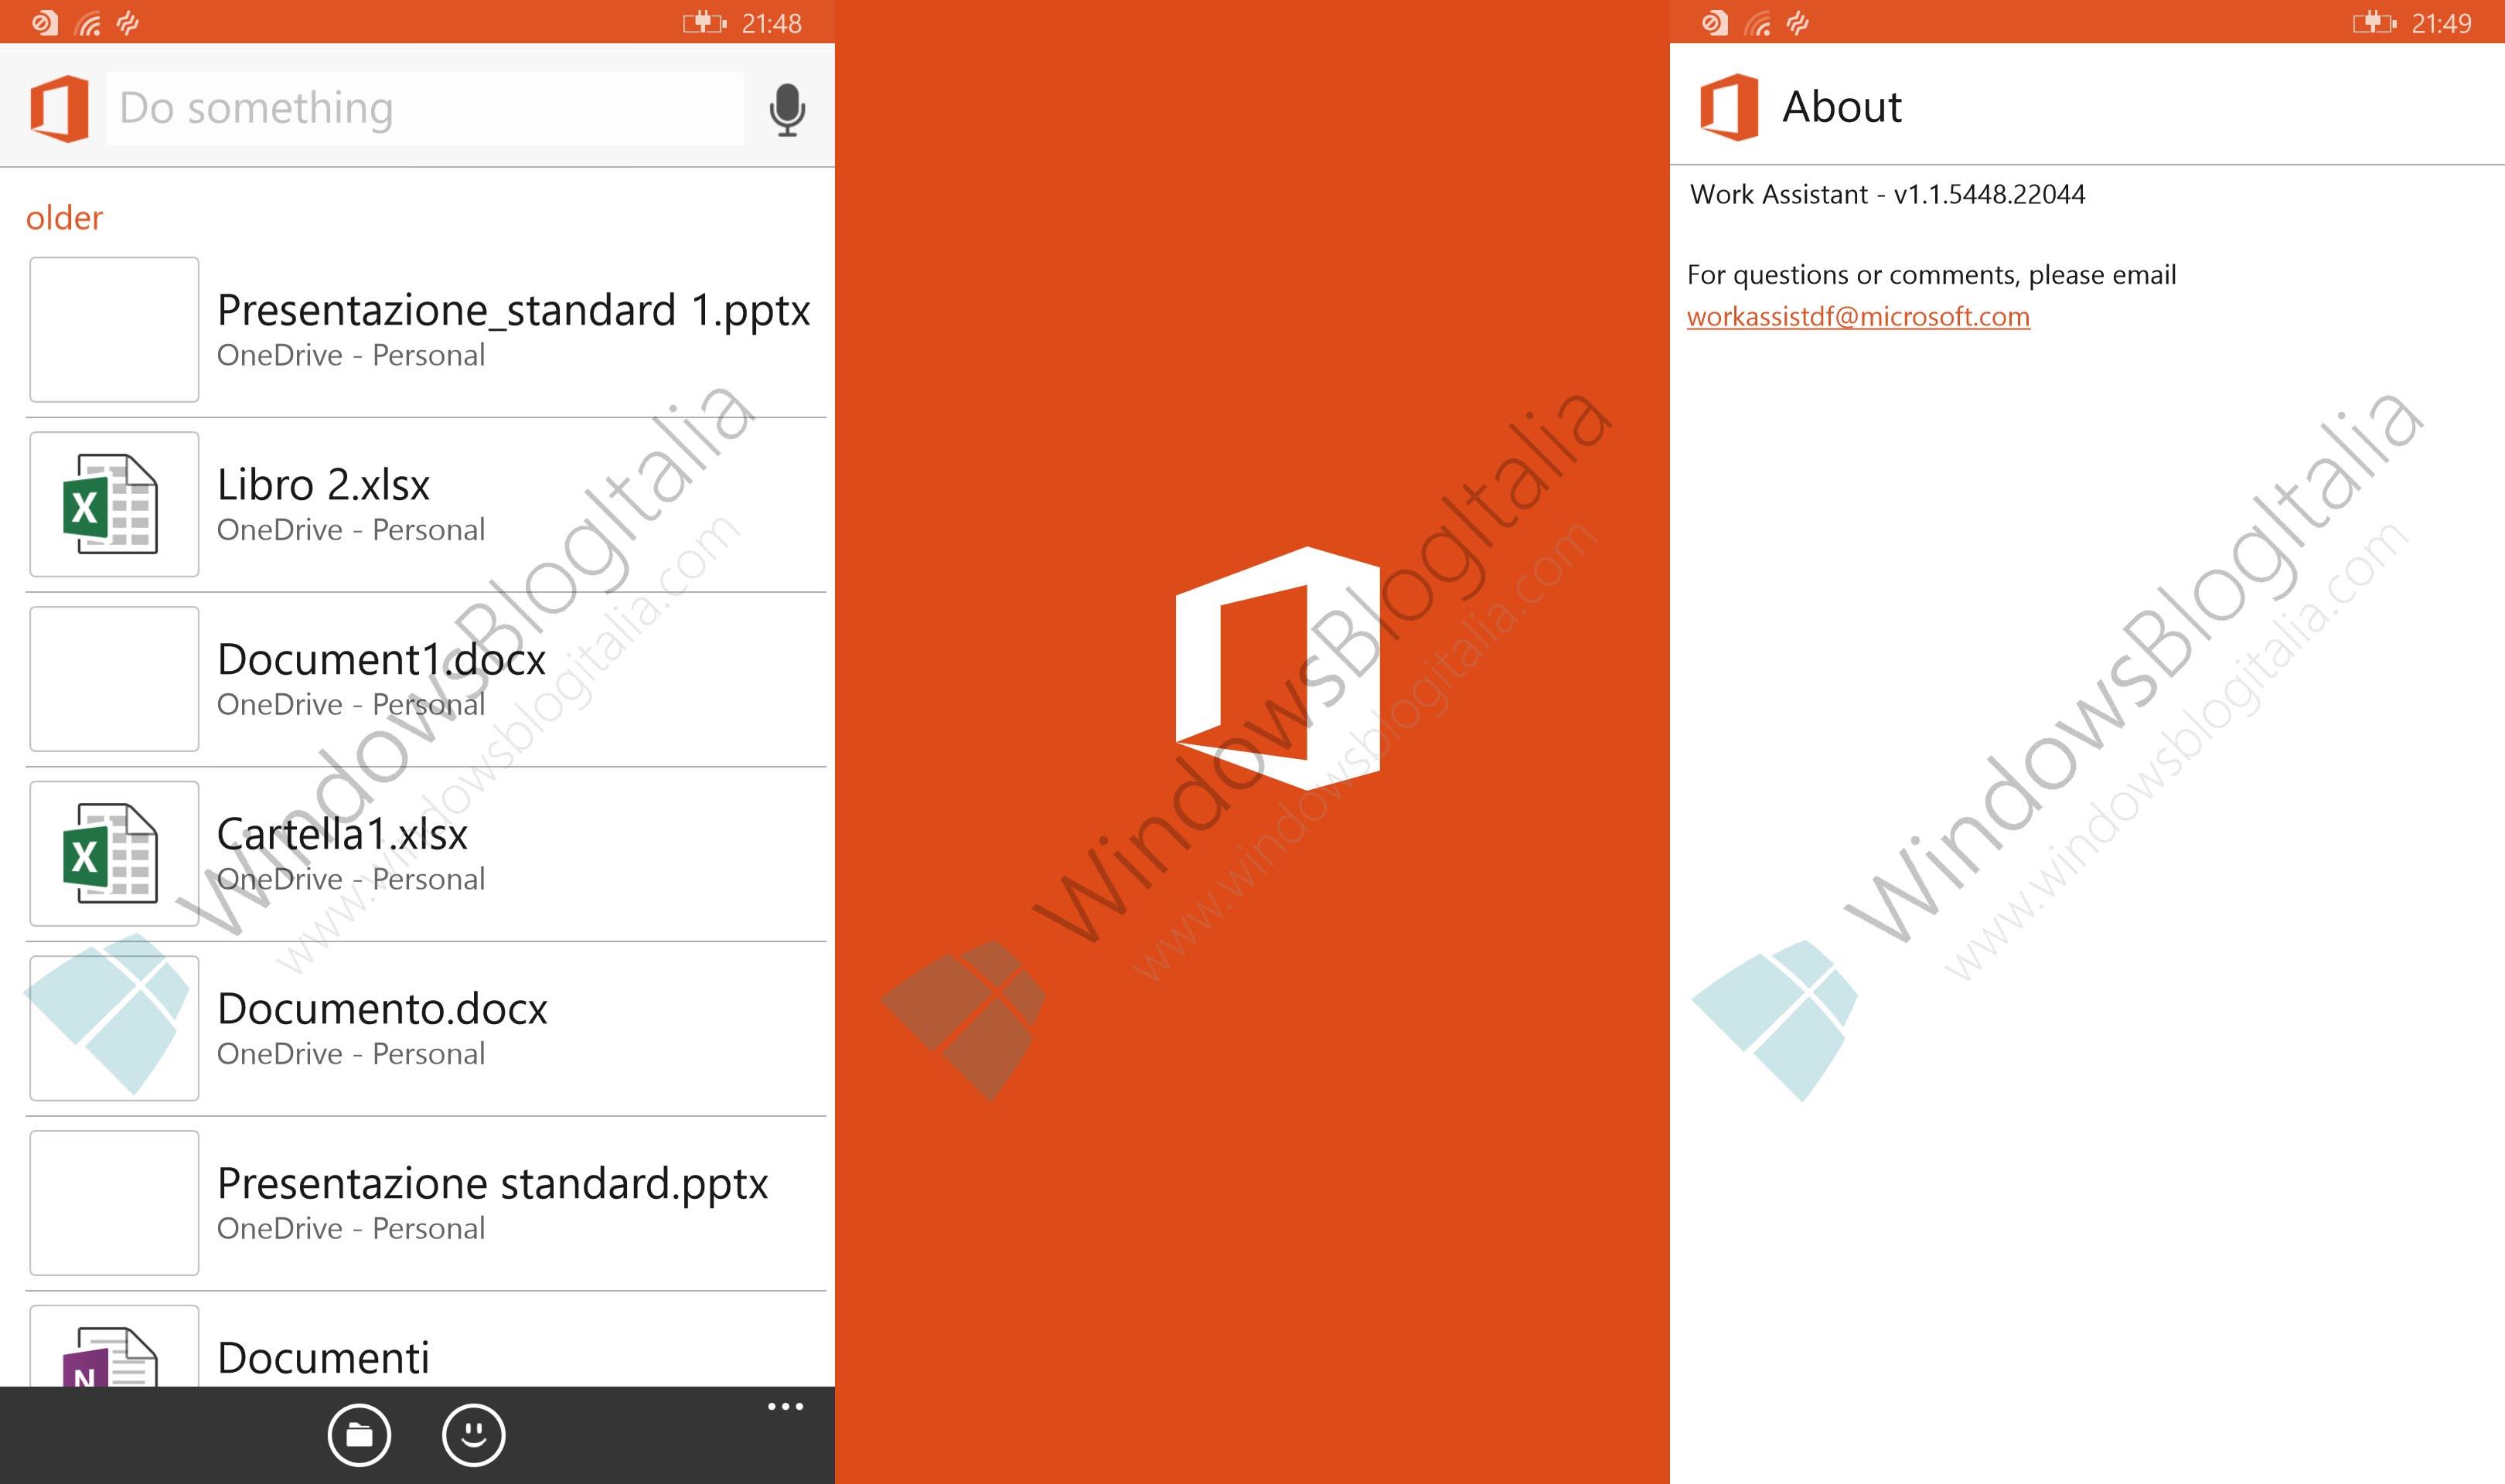 Microsoft work online?